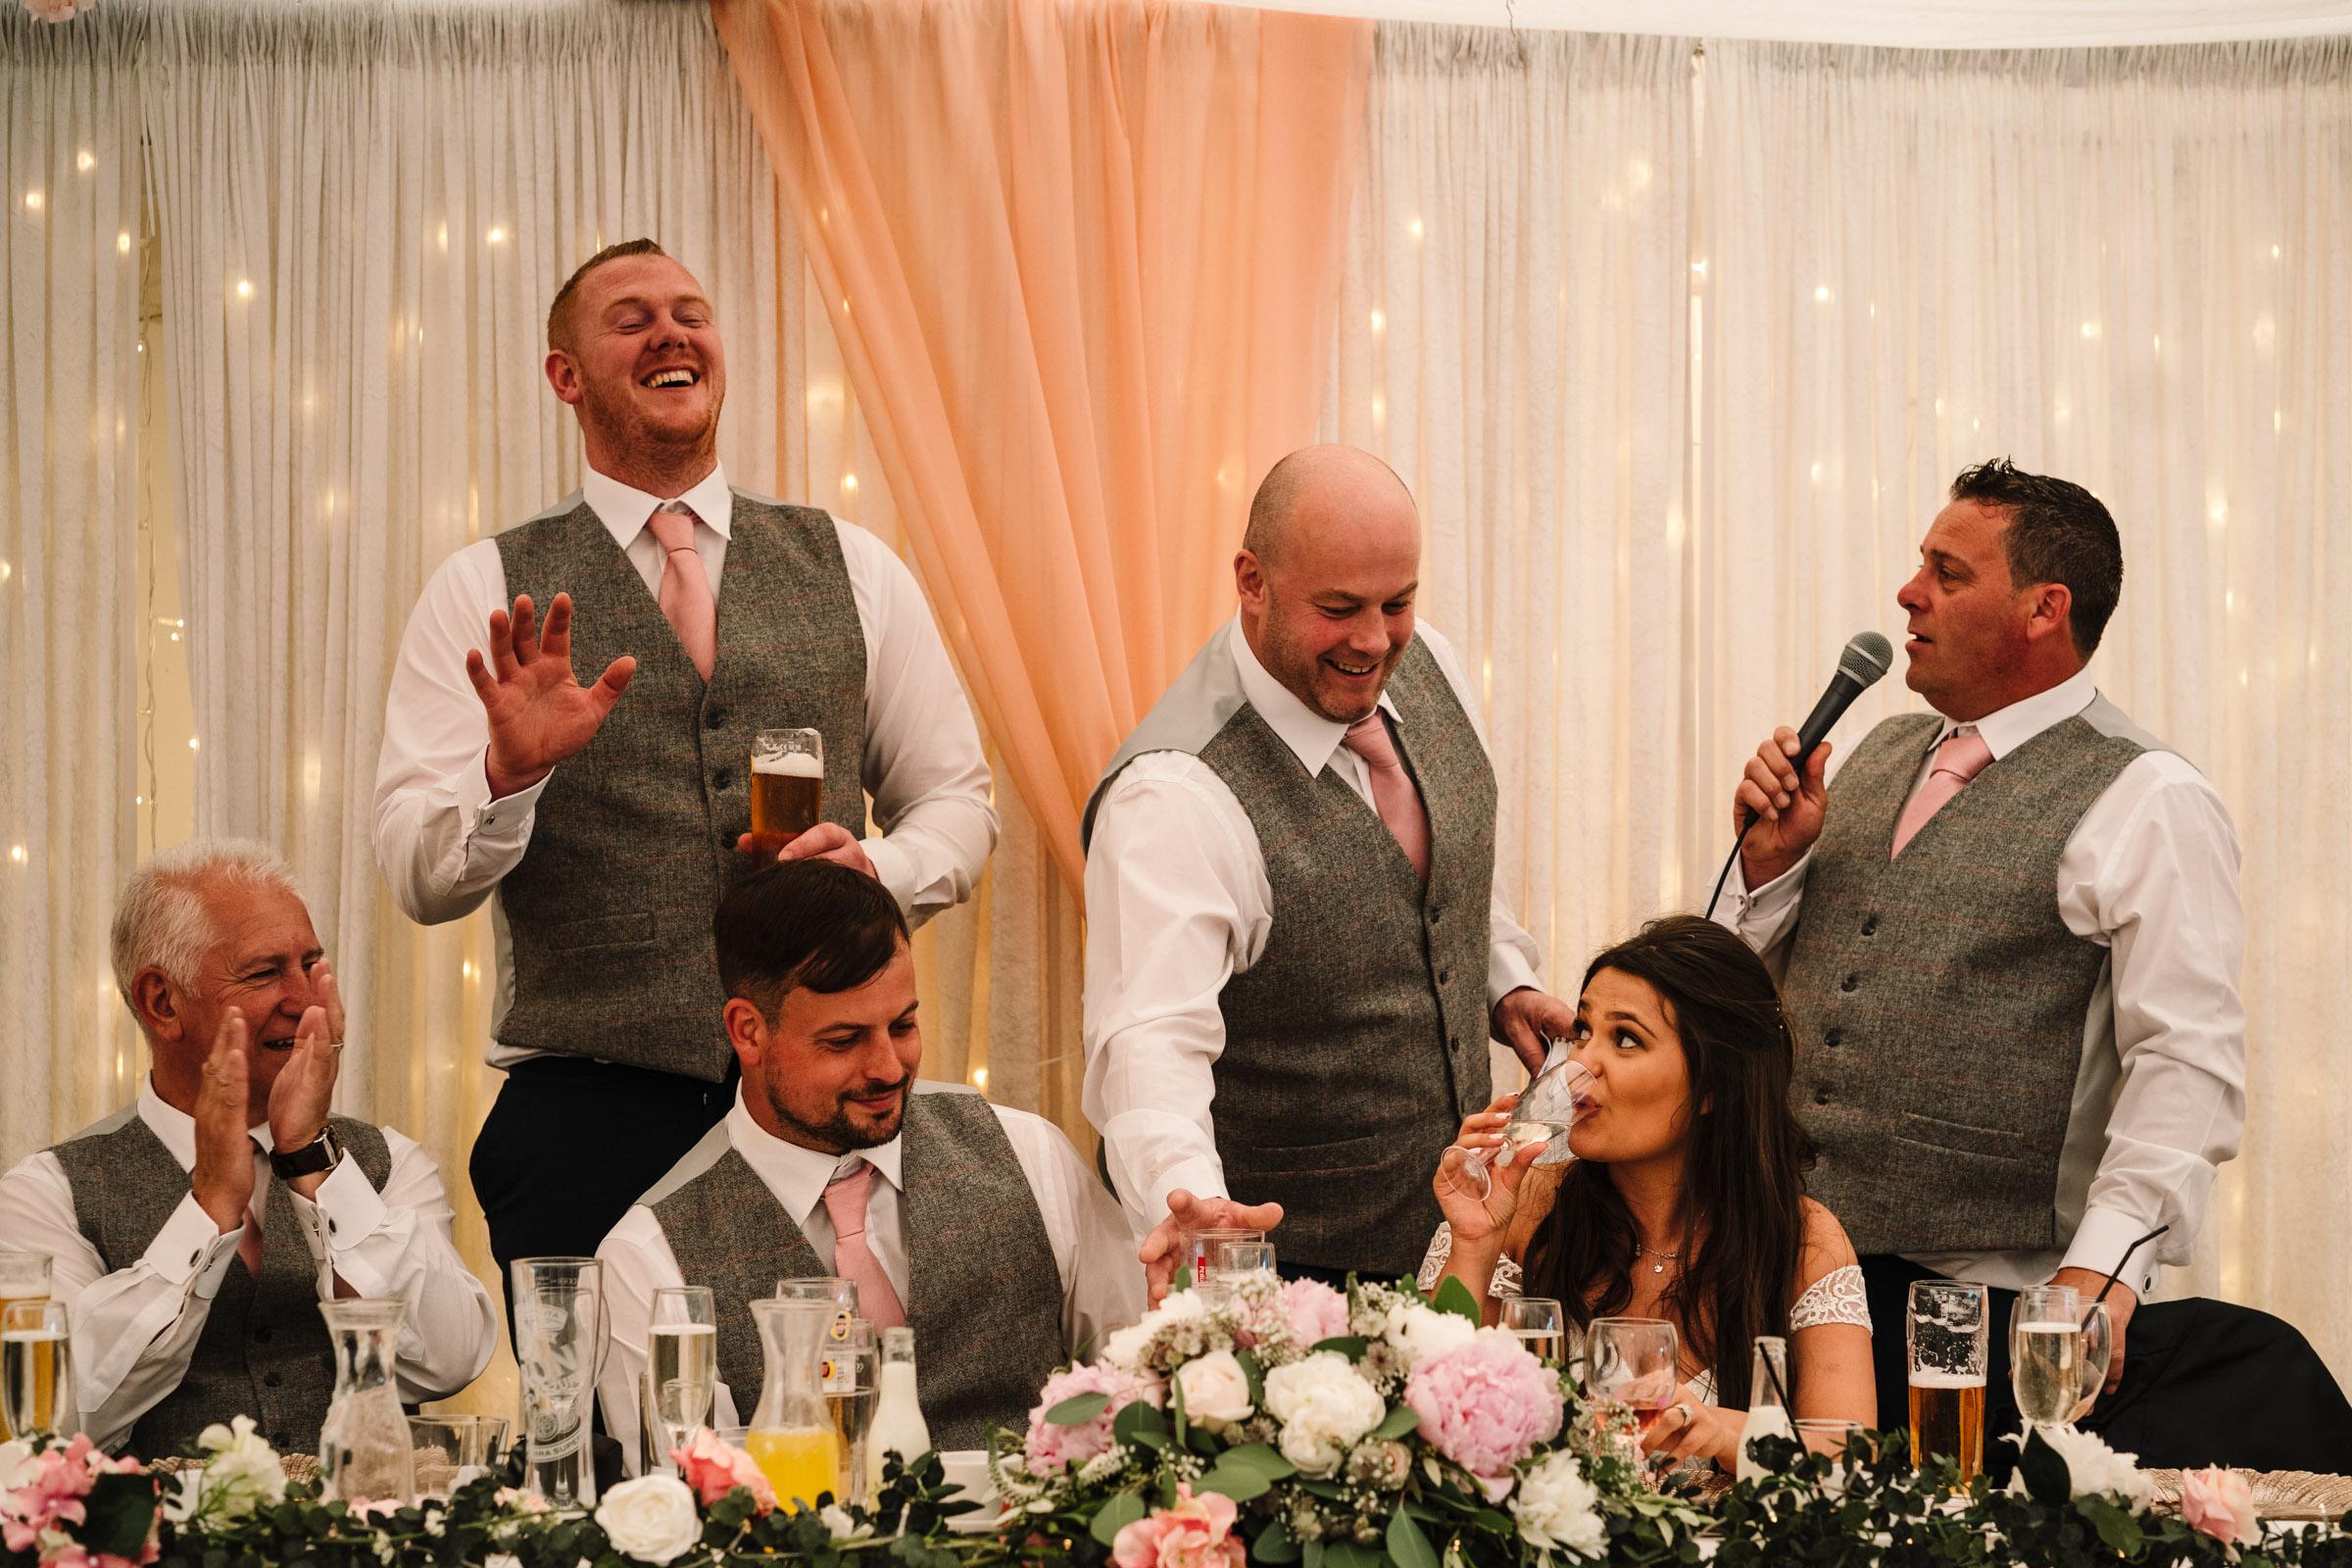 Best men speeches, royal arms wedding